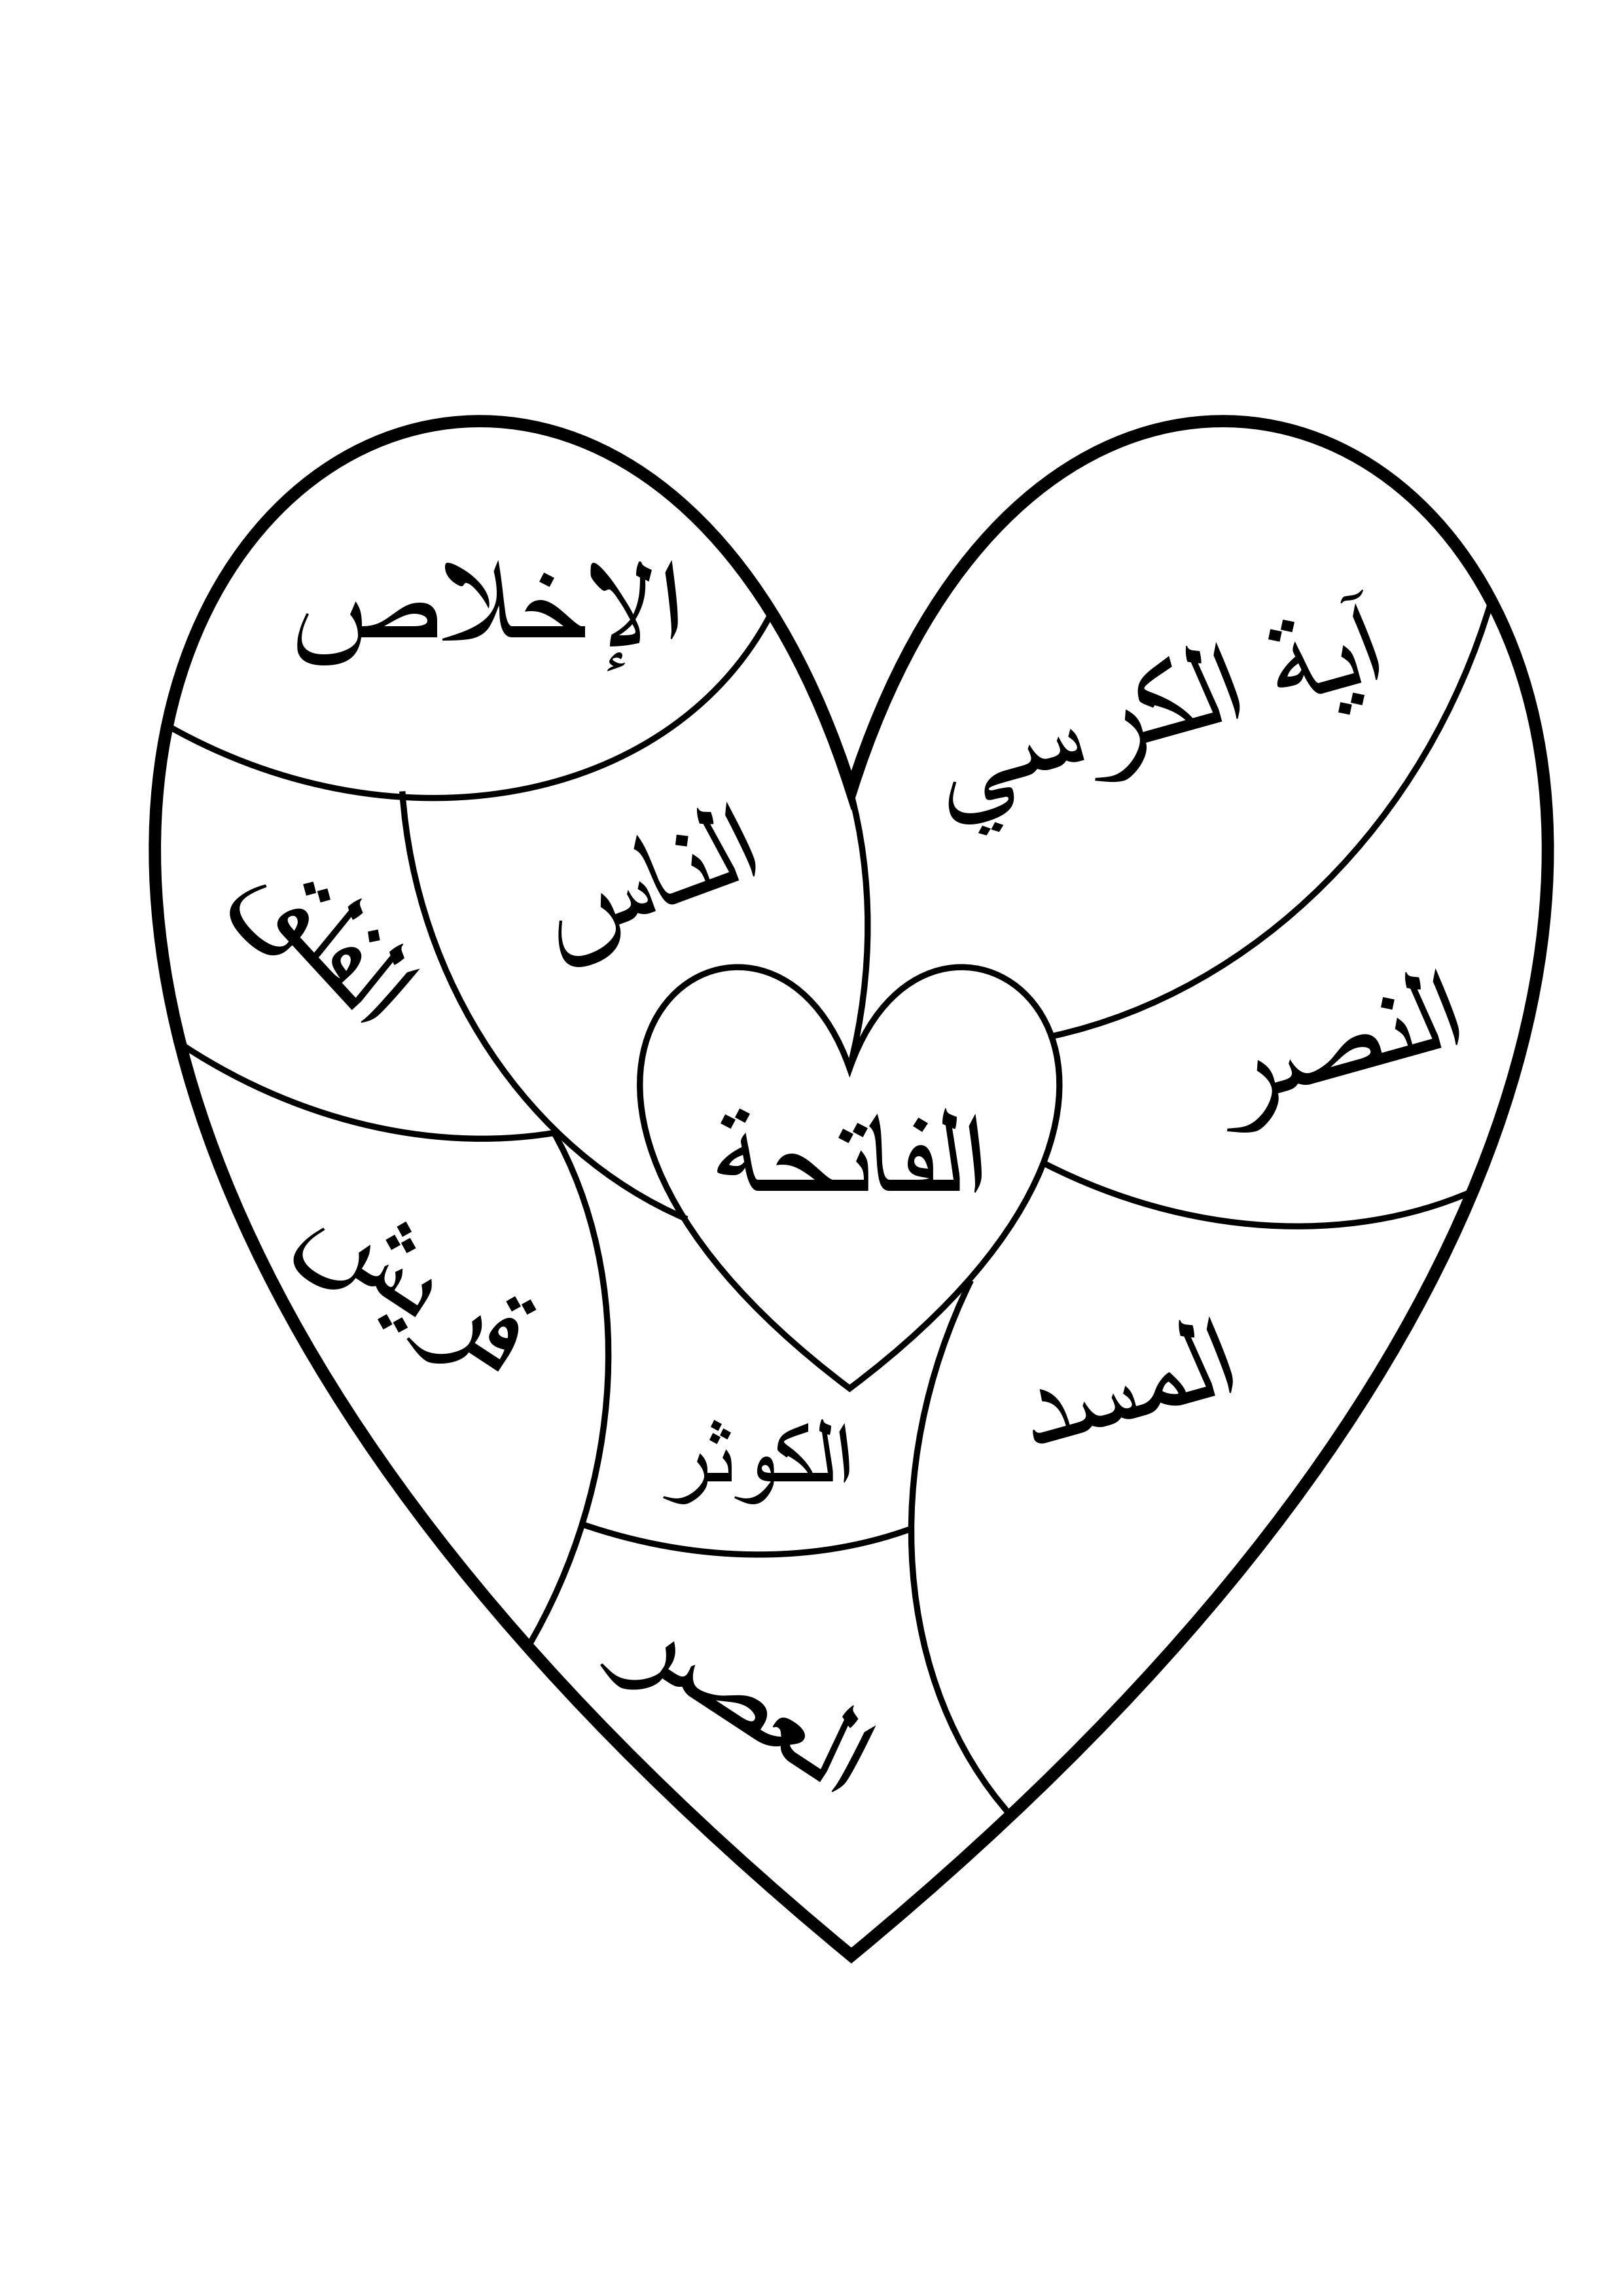 تعليم الأطفال قصار السور Learn Arabic Language Learning Arabic Baby Education